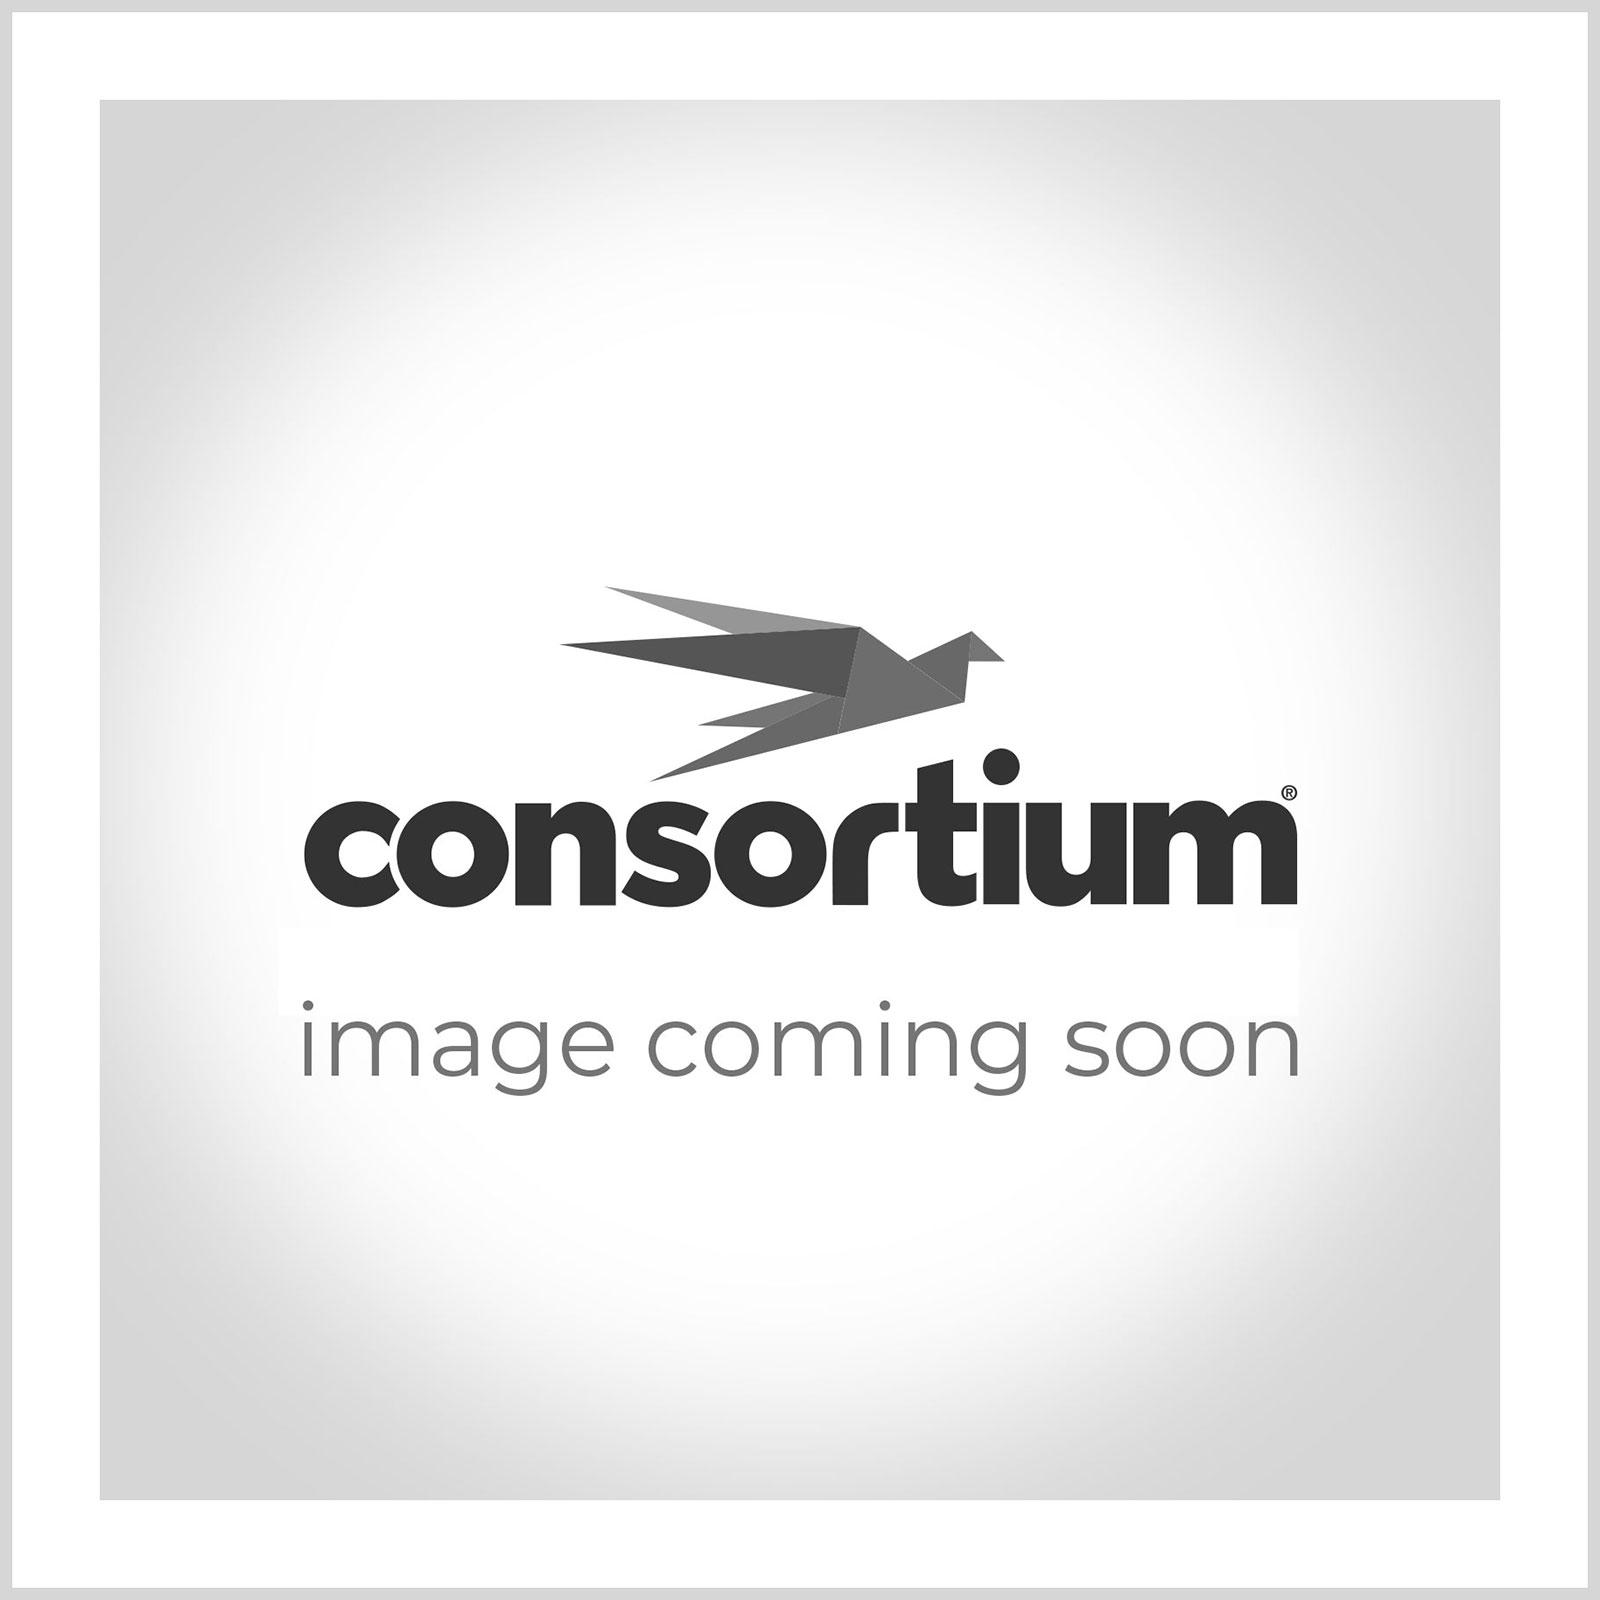 BIG DEAL Titan Swivel Chairs 30 Pack Multi-Buy Bundle